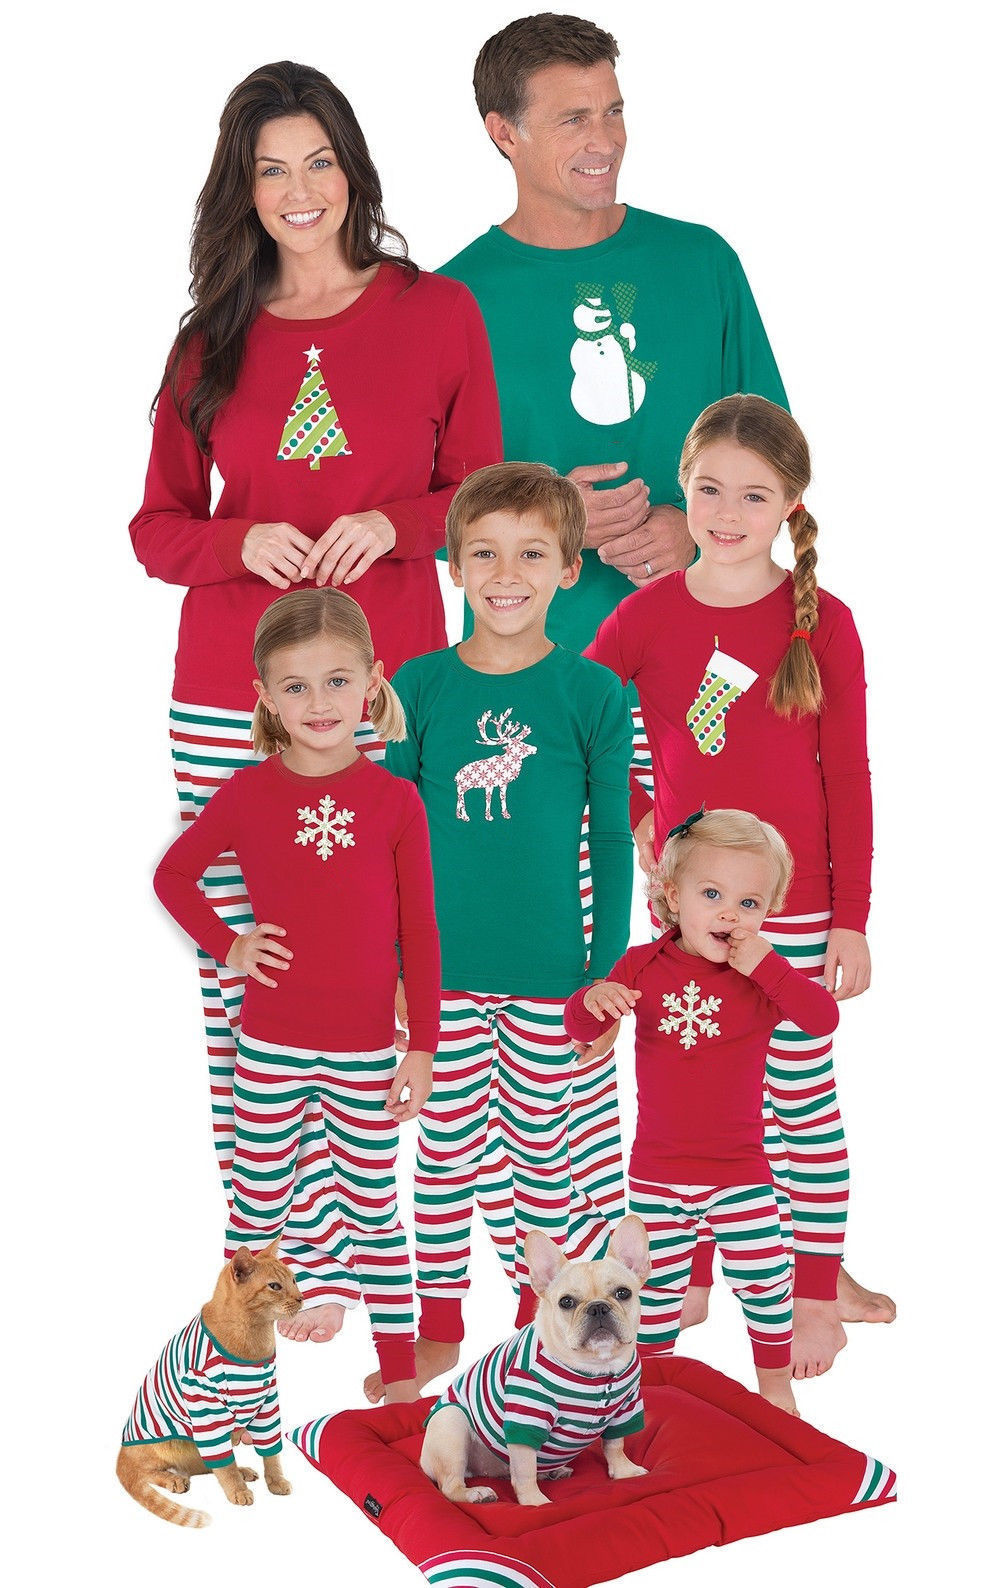 PUDCOCO Newest 2018 Hot Christmas Family Matching Pajamas ...